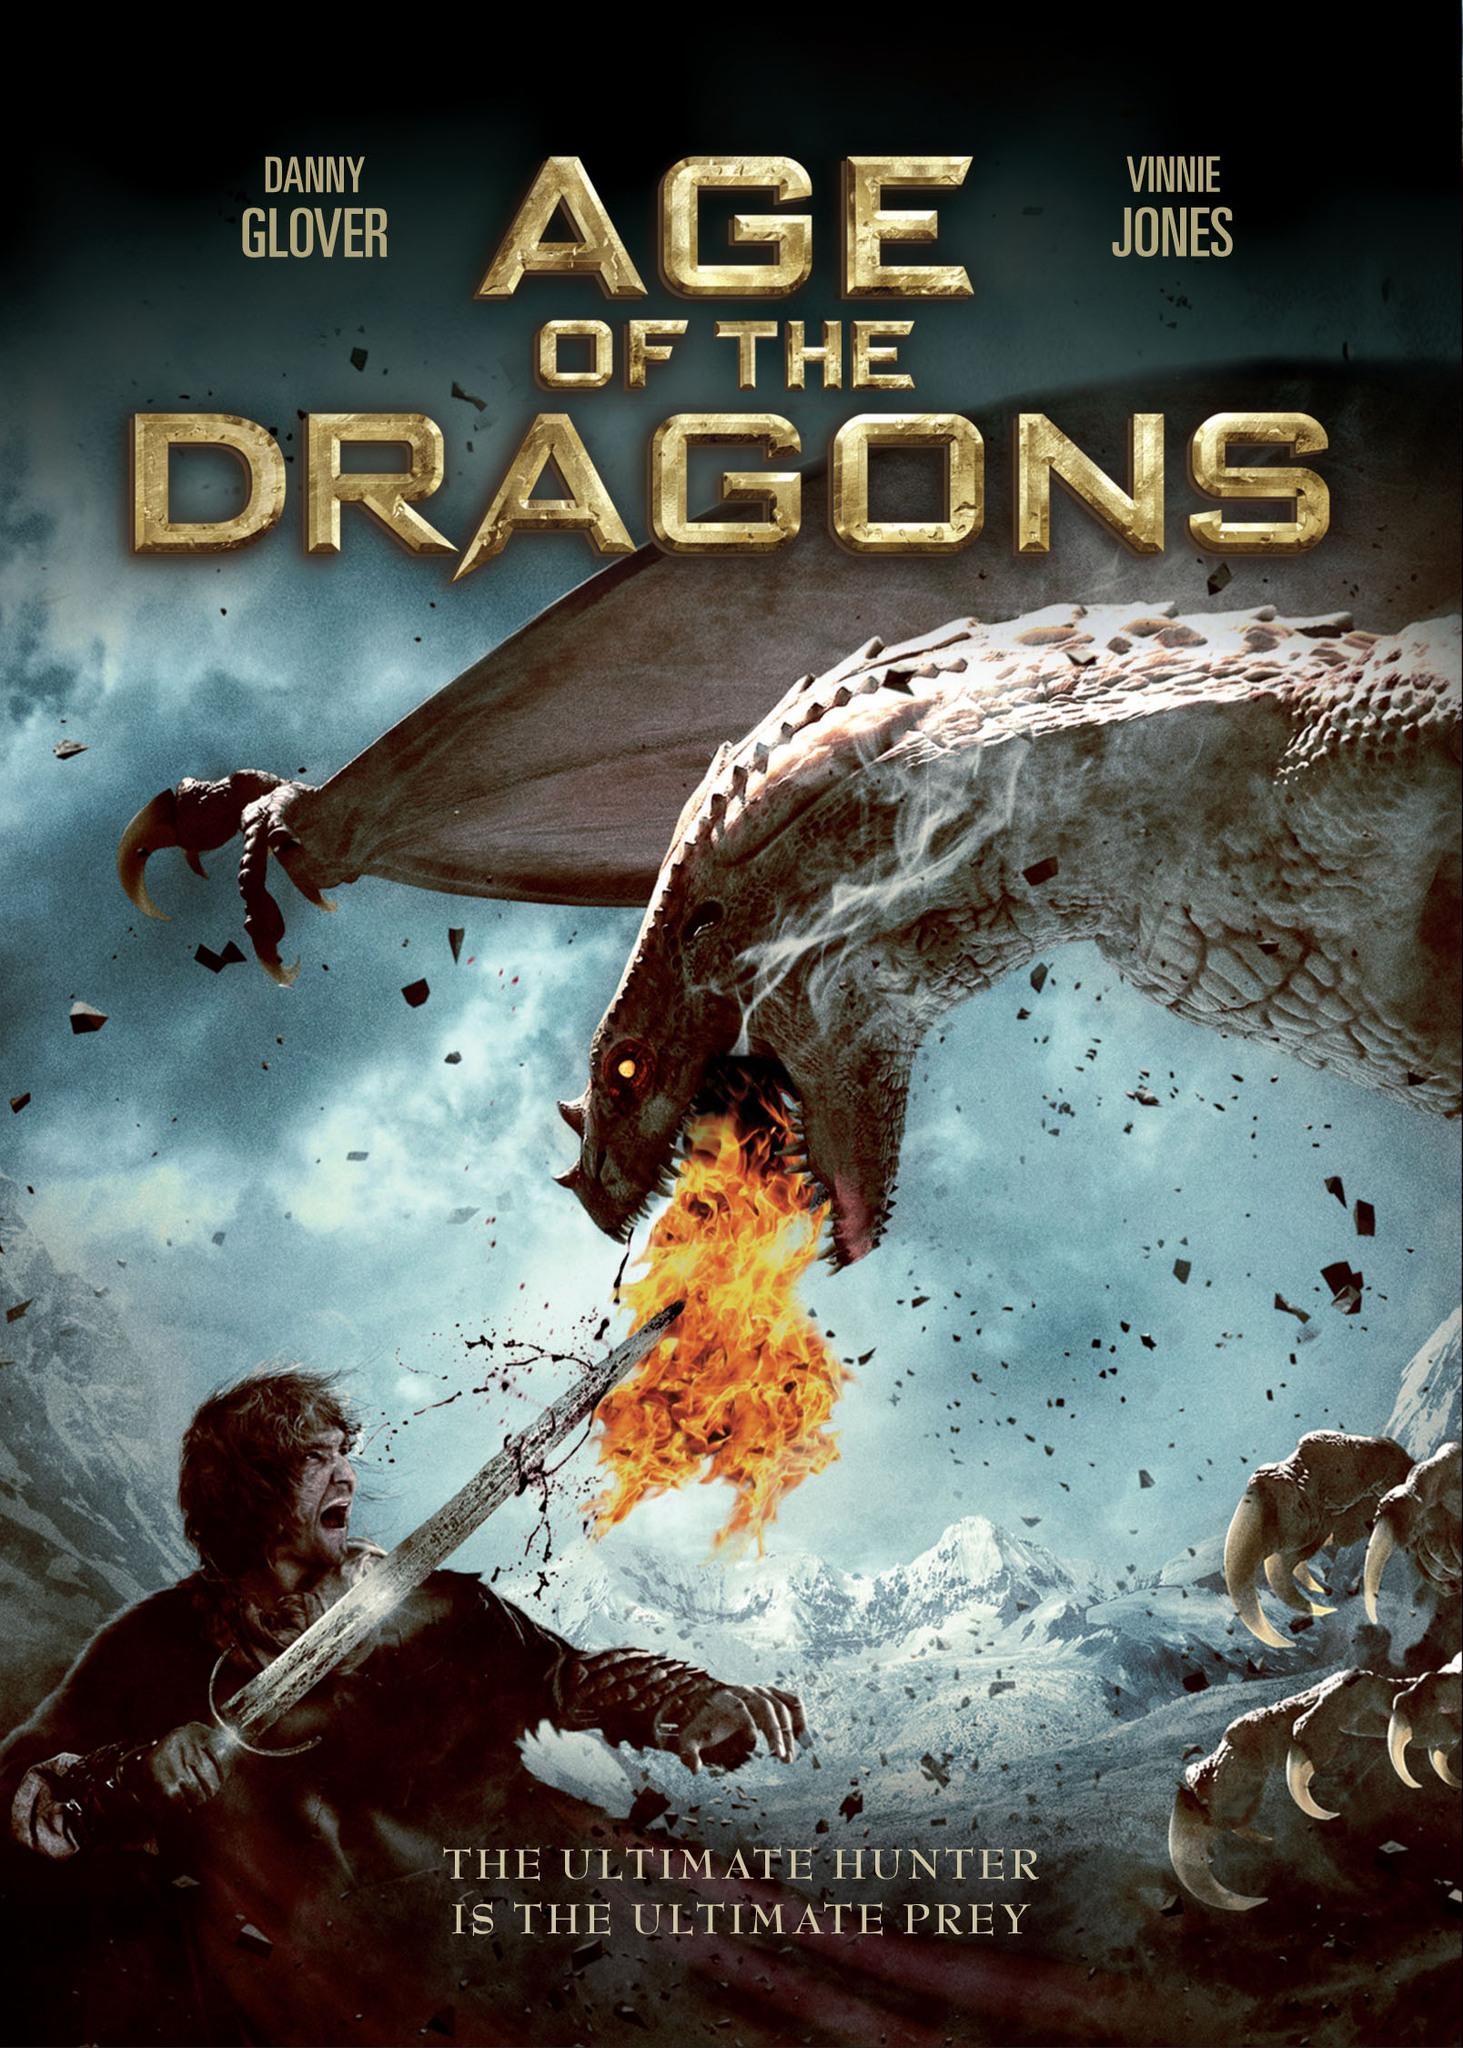 Revenge of the dragon 02 scene three